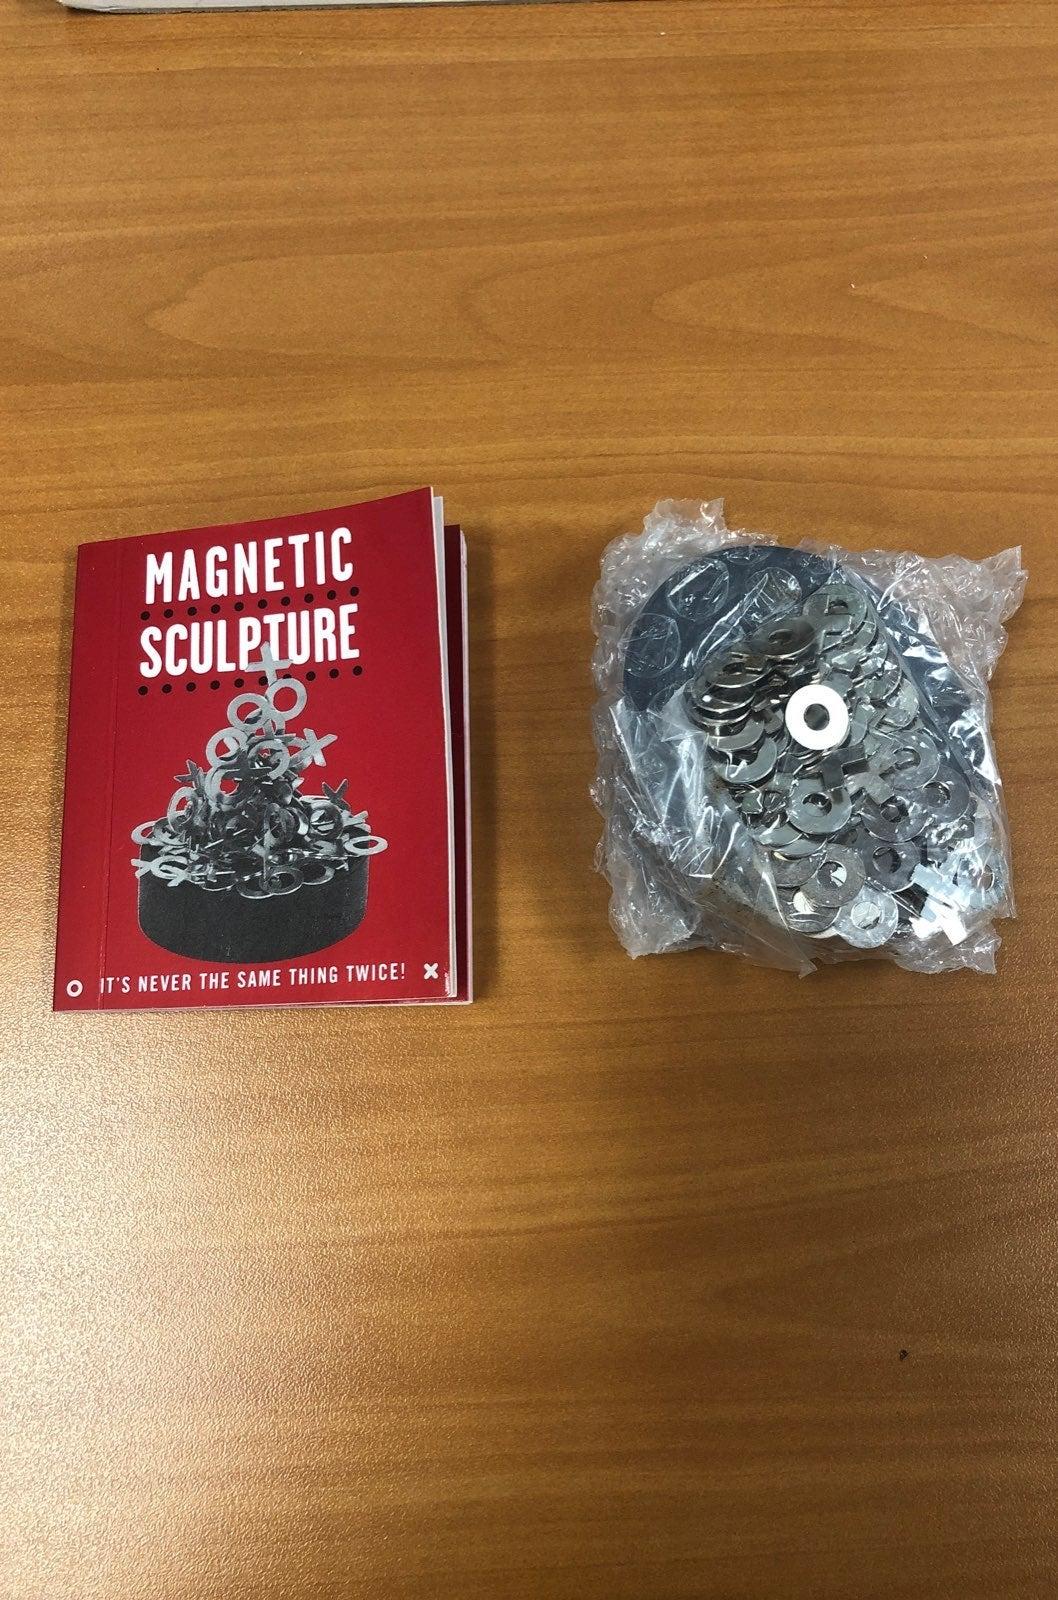 new magnetic sculpture desk decor / toy